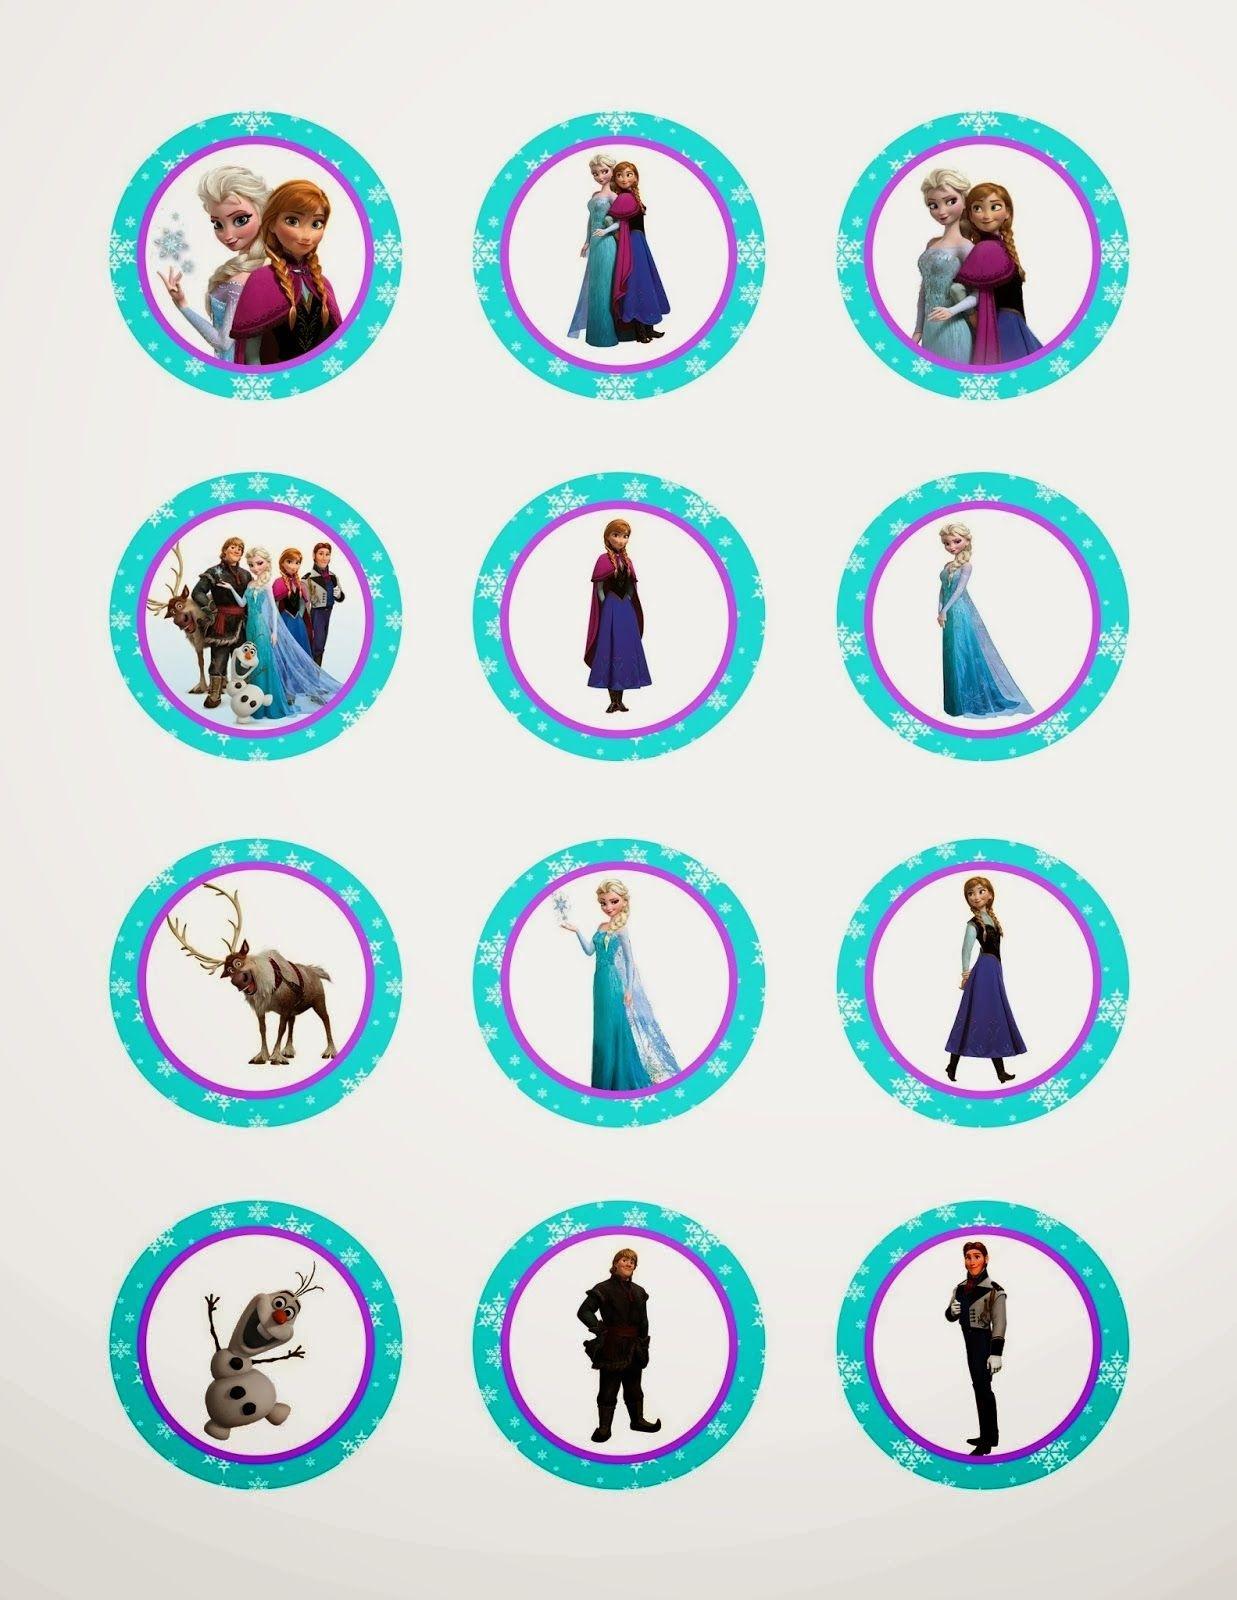 Frozen Cupcake Ideas Frozen: Free Printable Toppers   Birthday - Frozen Cupcake Toppers Free Printable